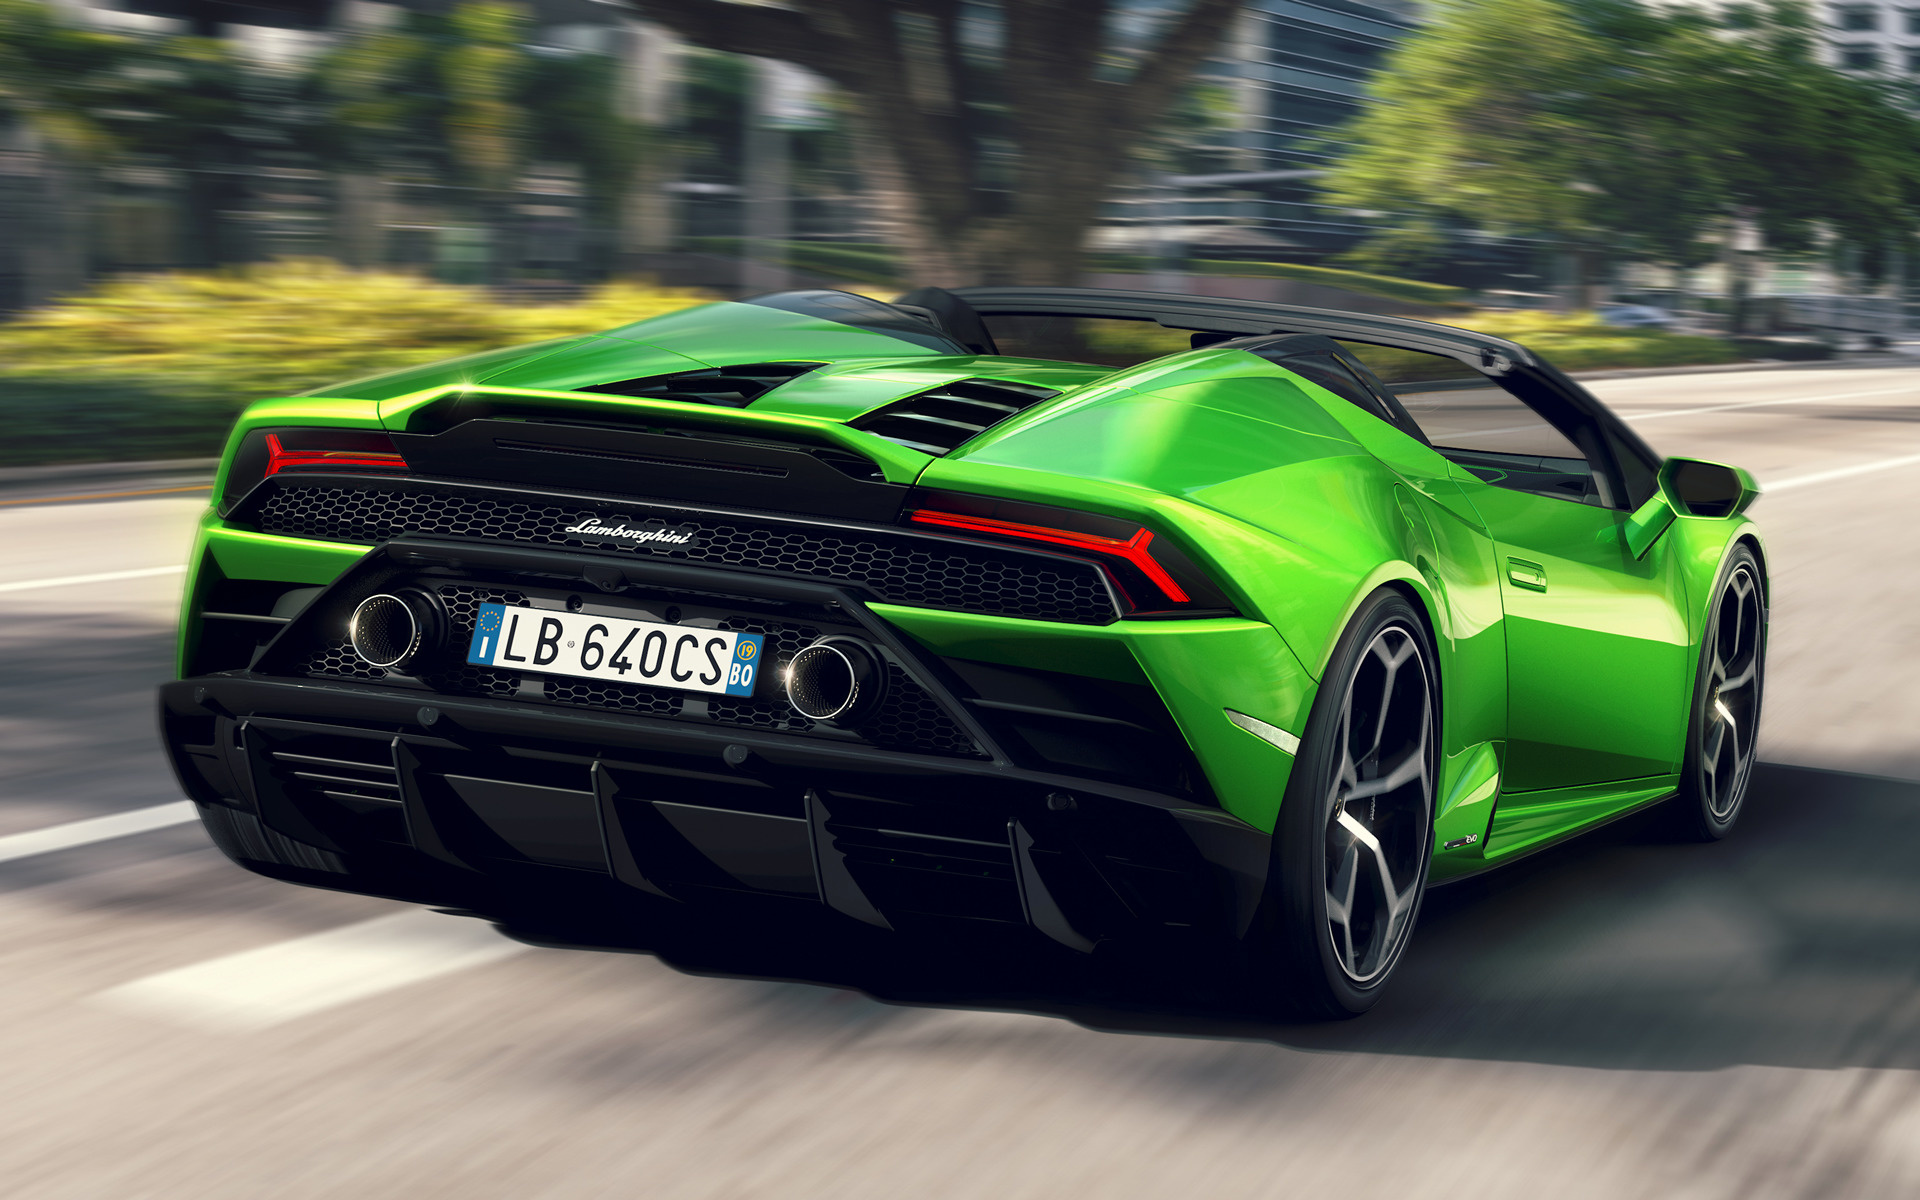 2019 Lamborghini Huracan Evo Spyder Wallpapers And Hd Images Car